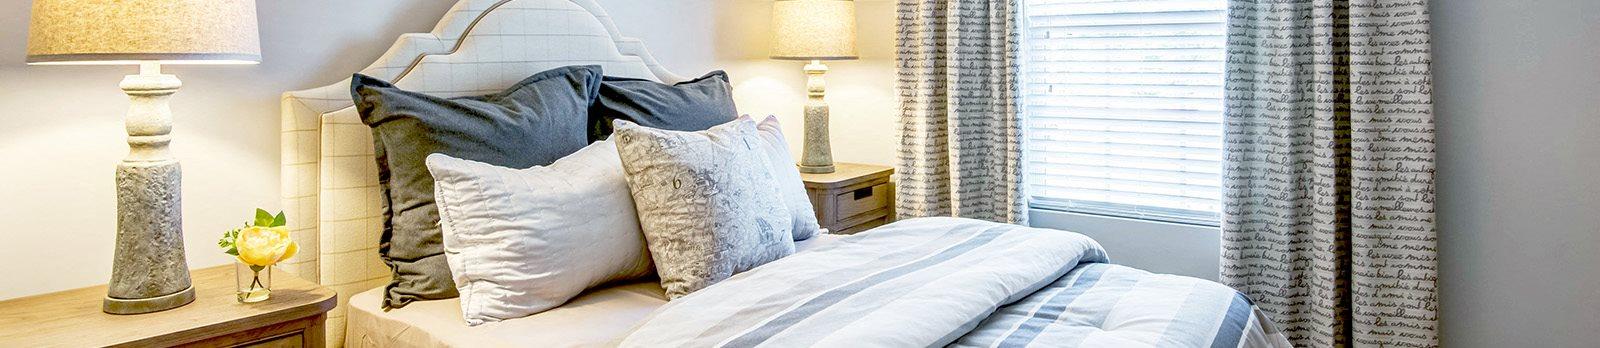 Luxurious Interiors  at Treybrooke Village Apartments, North Carolina, 27406